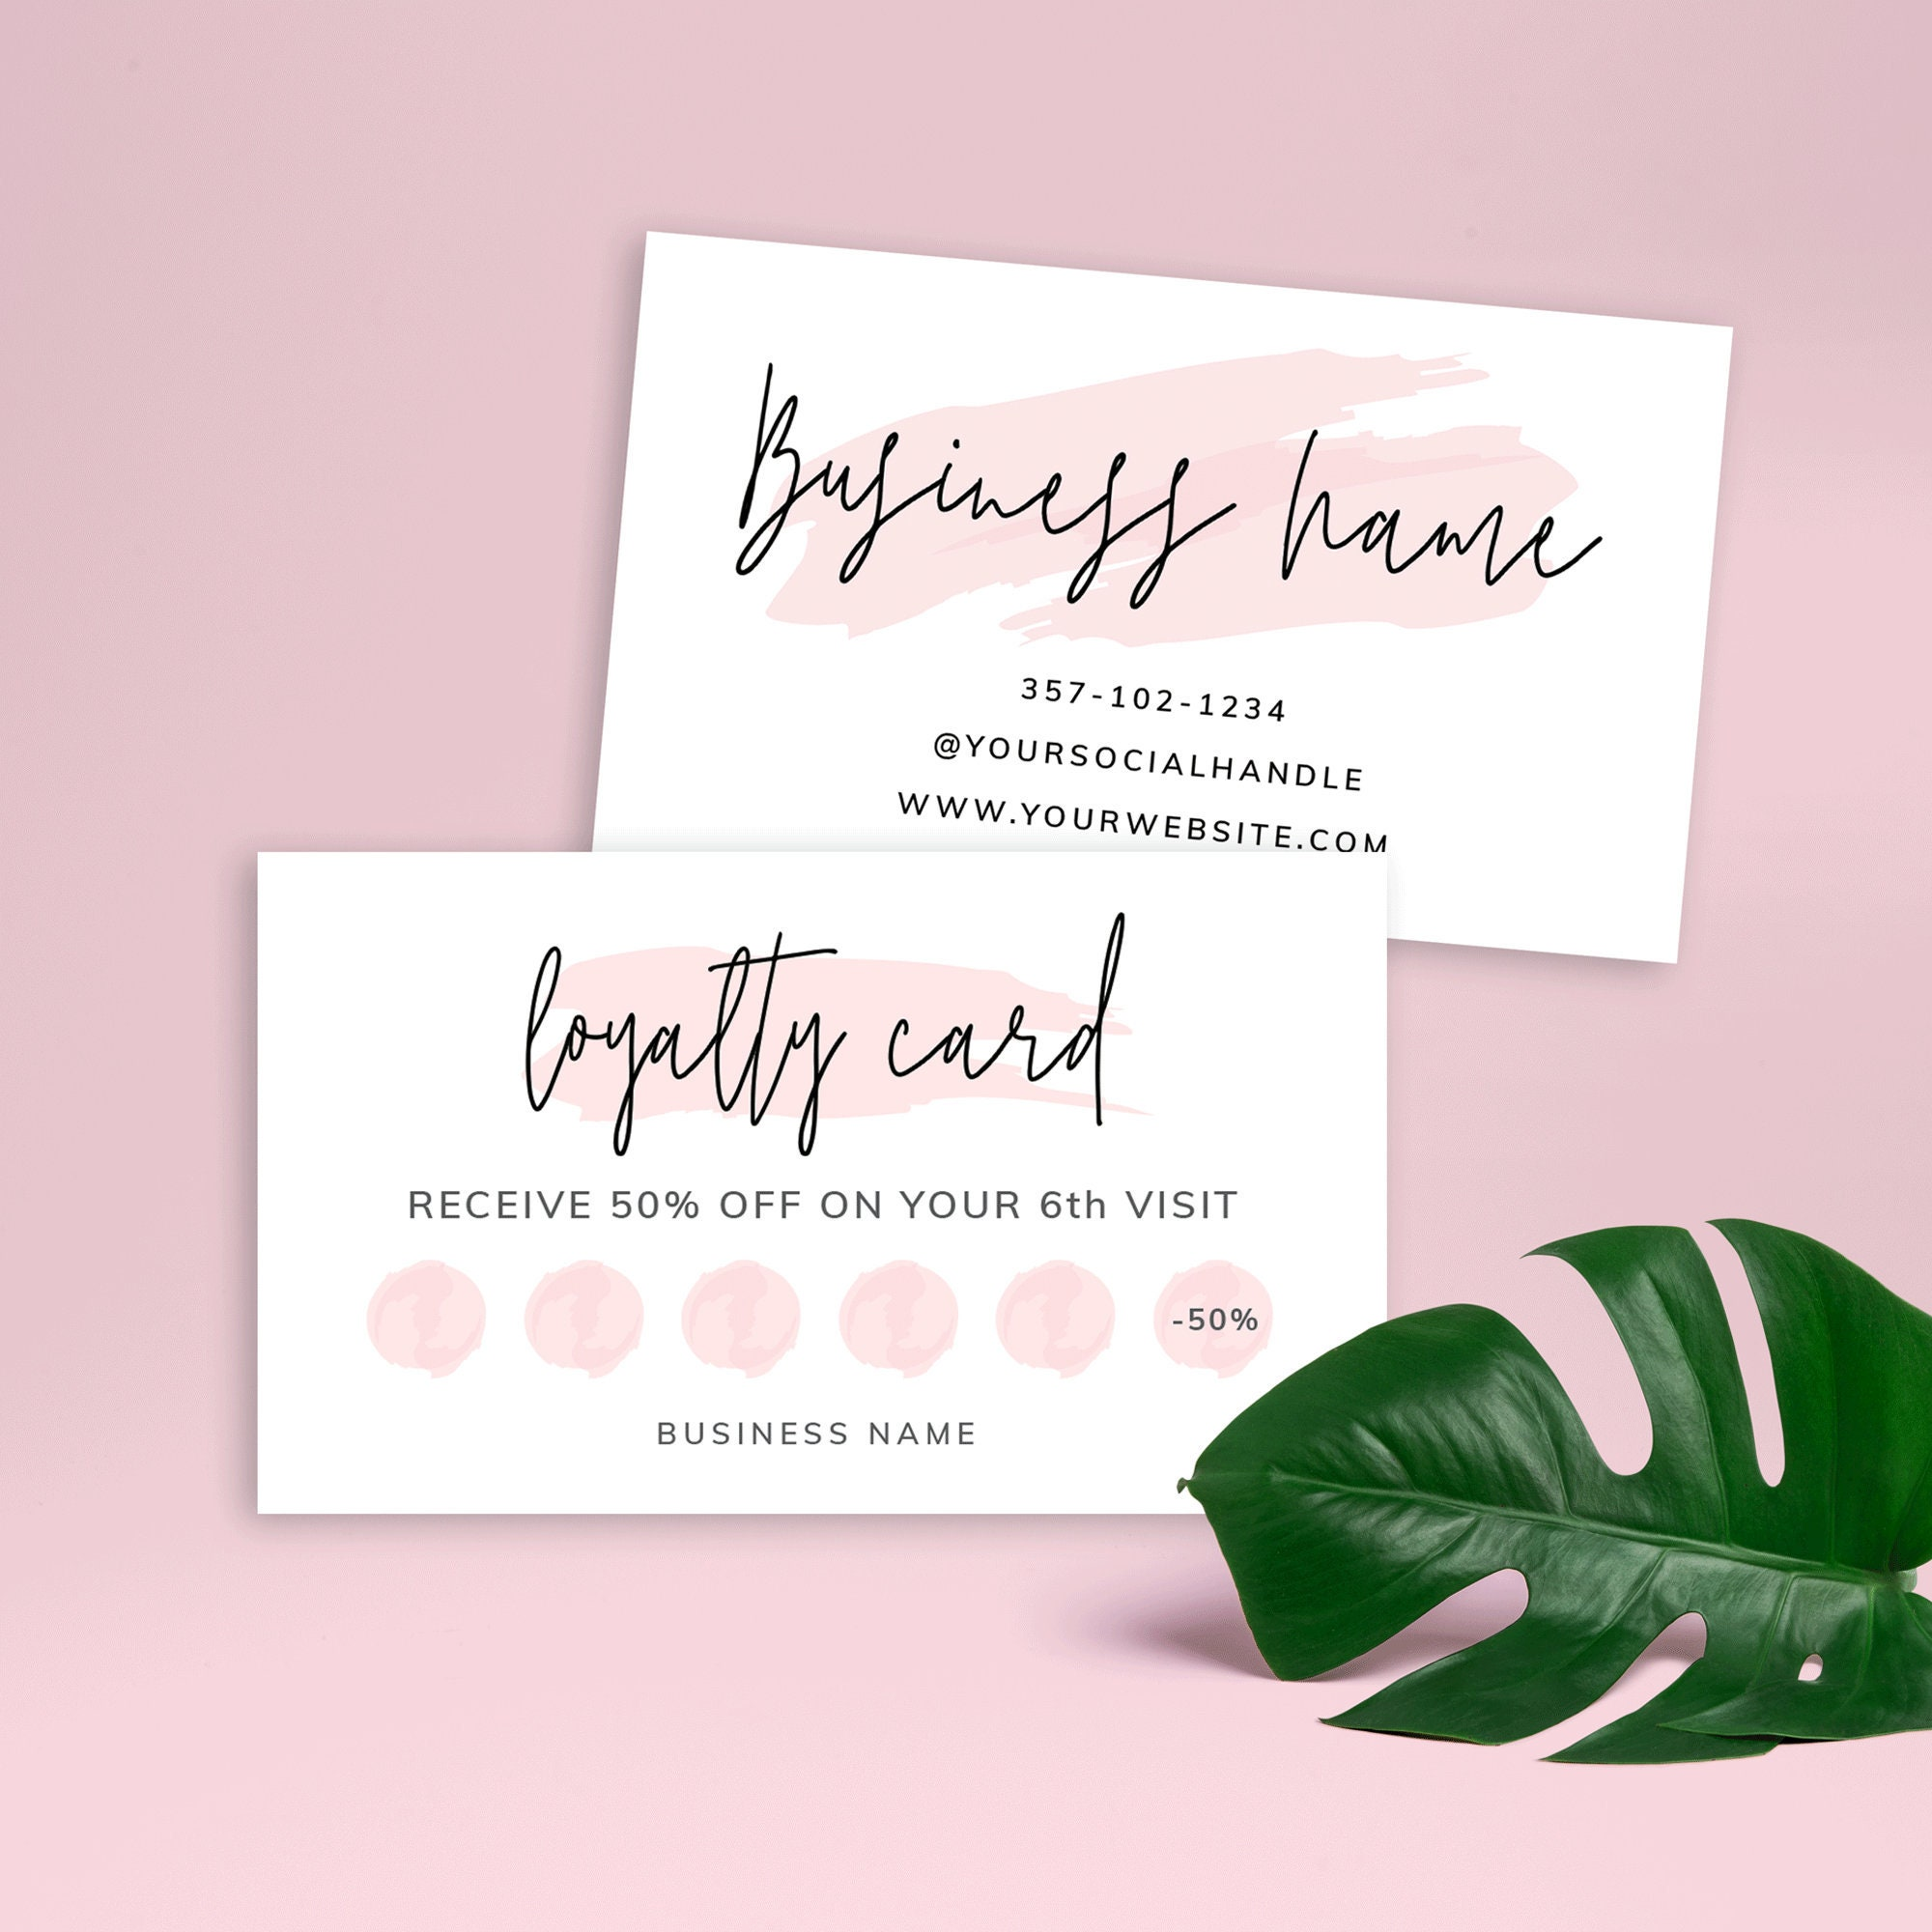 Printable Loyalty Card, Beauty Loyalty Card Template, Editable Rewards  Card, Nail Salon Loyalty Card, Customer Rewards Cards, Lashes, PW-21 With Regard To Customer Information Card Template